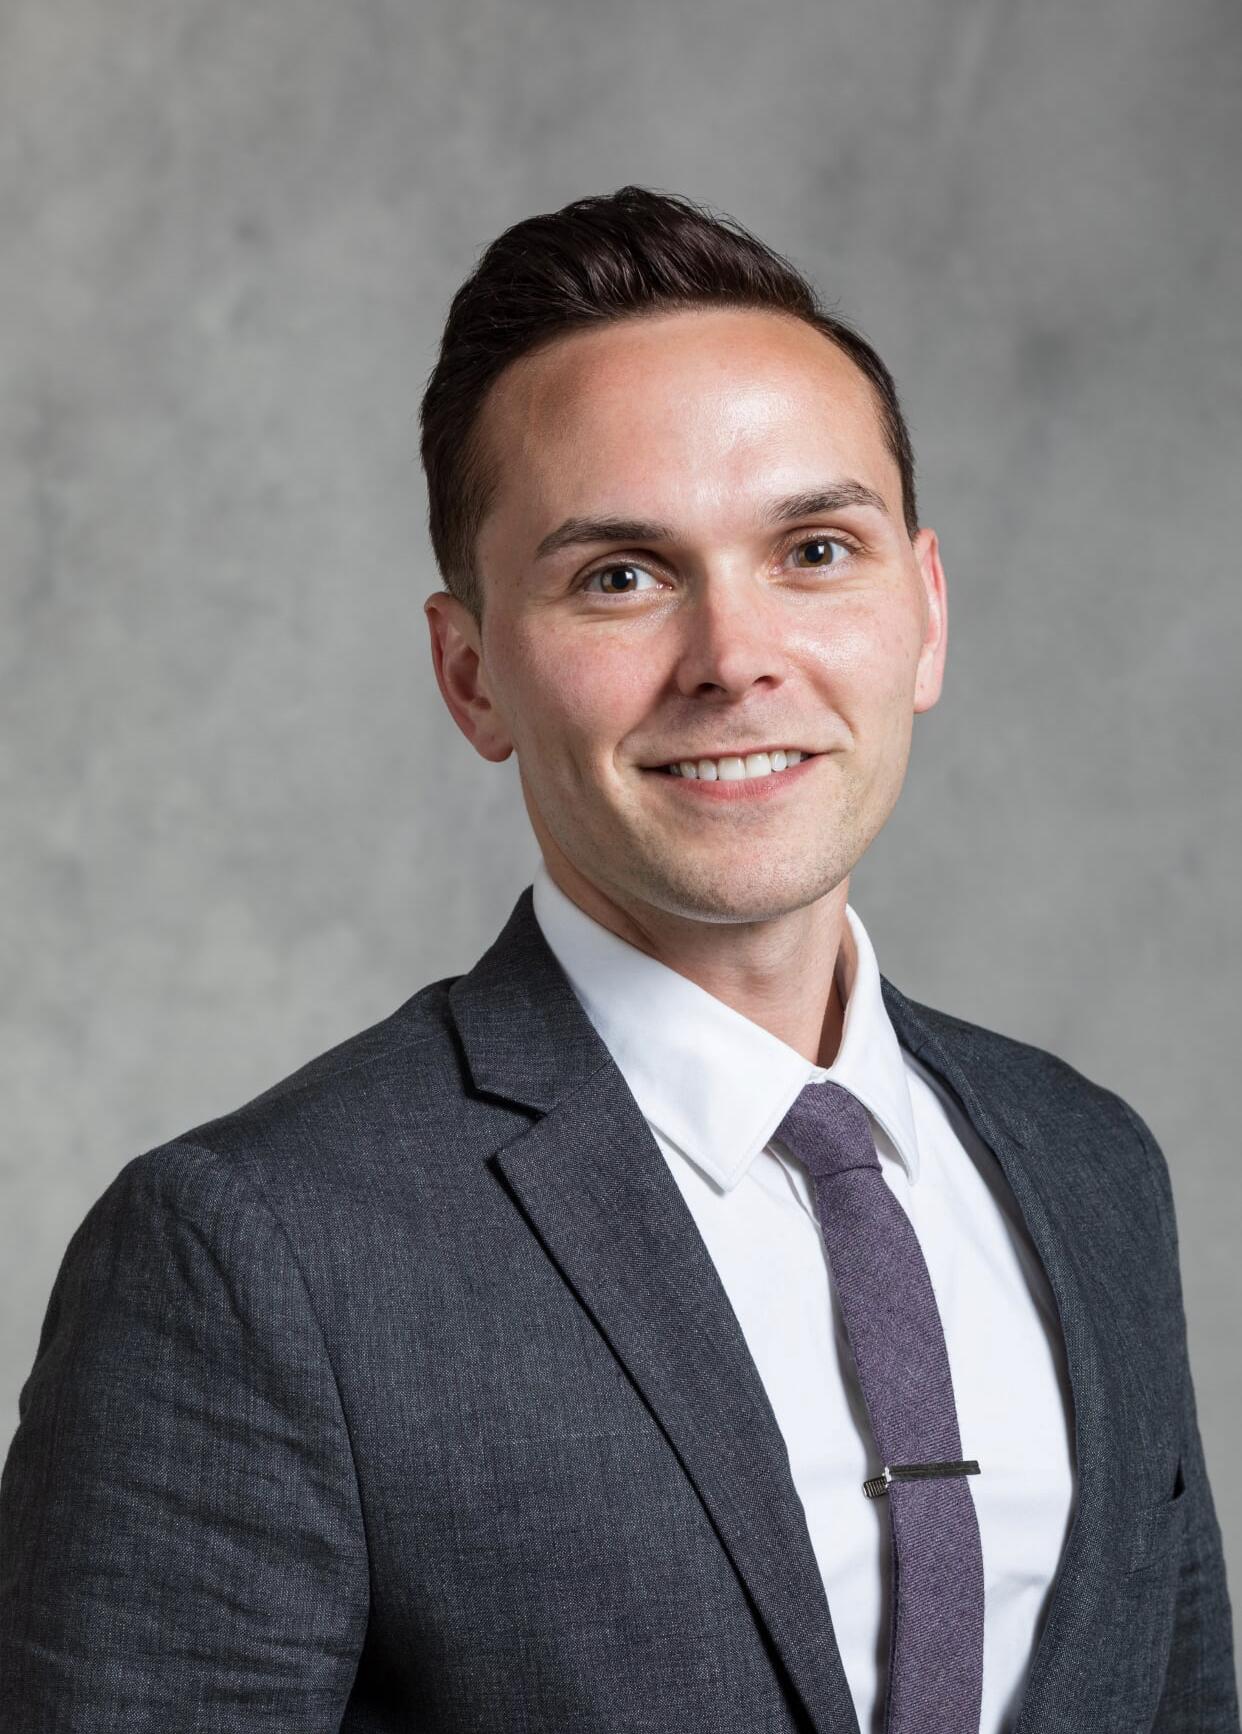 Steven Tholl  Budget & Finance Assistant  (330) 926-2564  stholl@summitlandbank.org